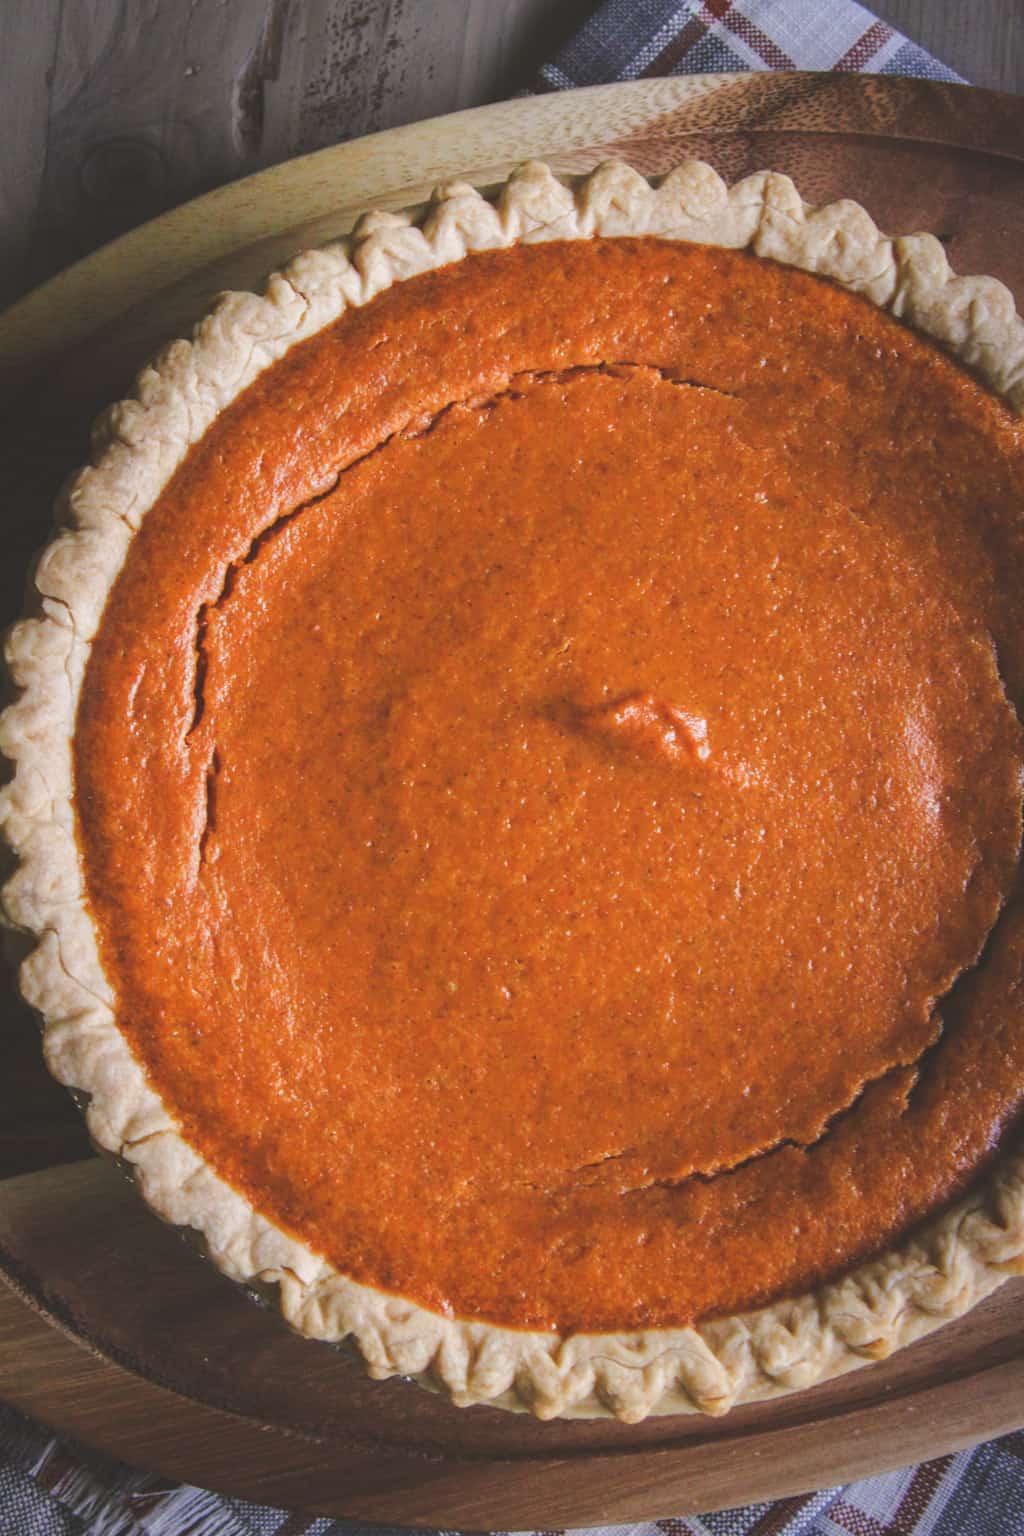 A super easy 5 ingredient pumpkin pie recipe